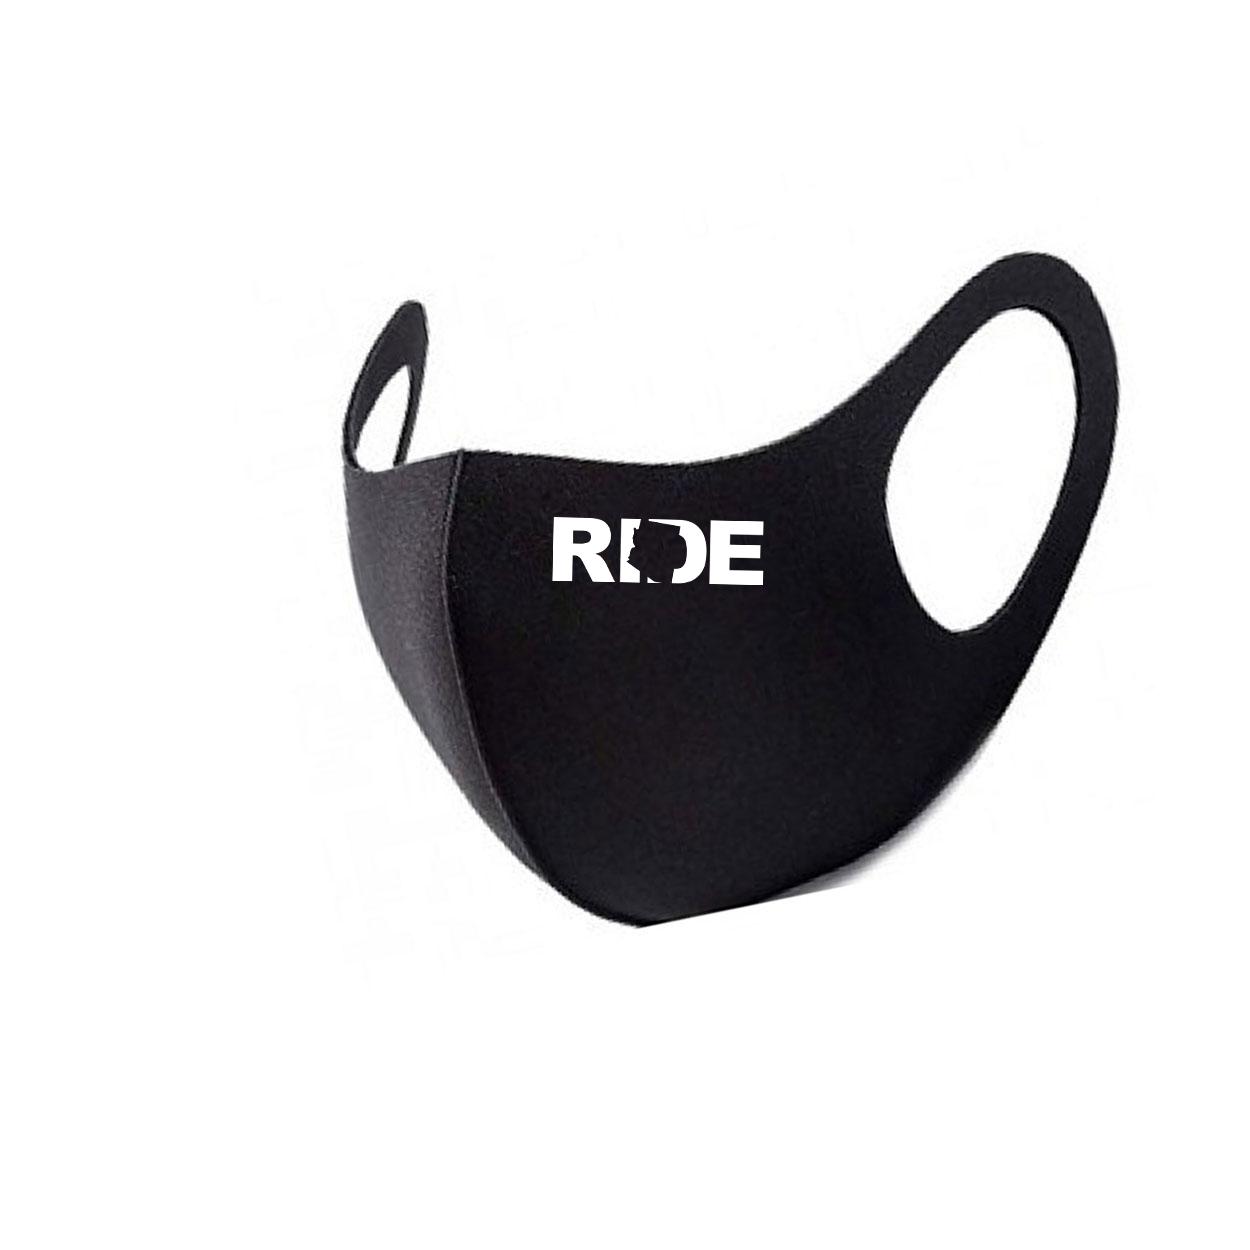 Ride Arizona Night Out Fitted Washable Face Mask Black (White Logo)